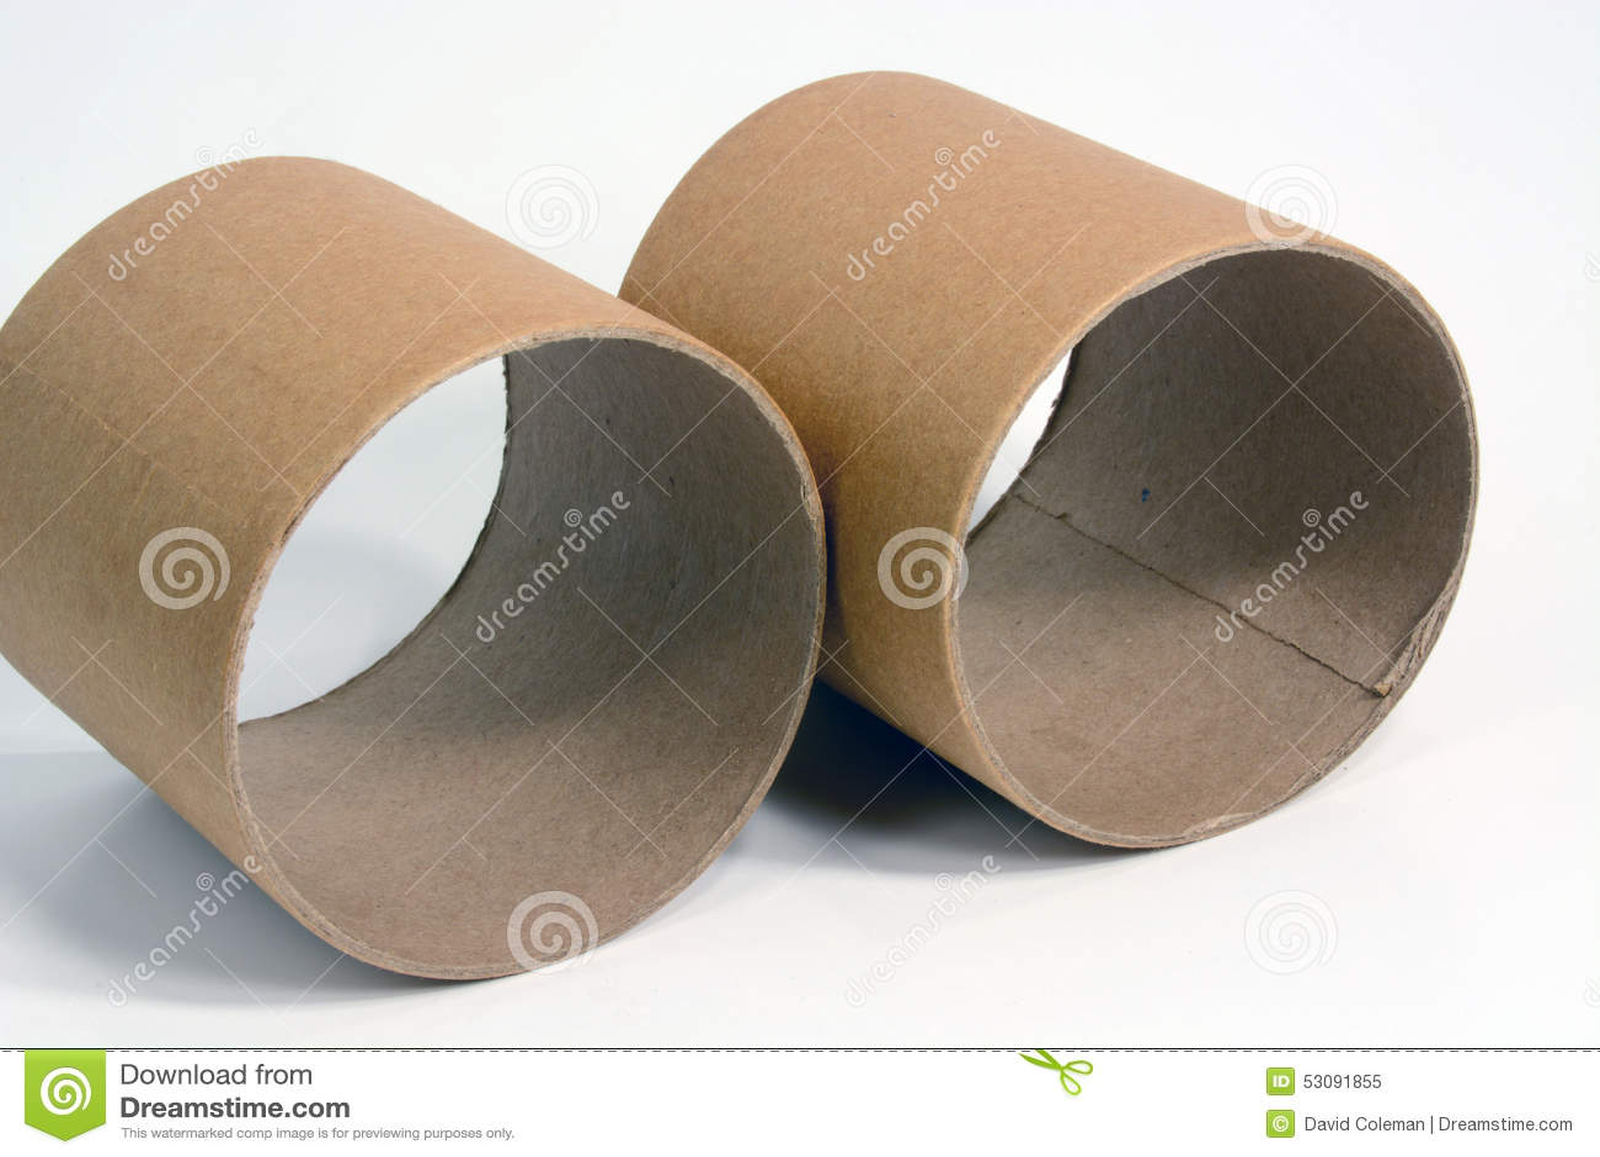 Cilindri di cartone ht25 regardsdefemmes for Tubi in cartone